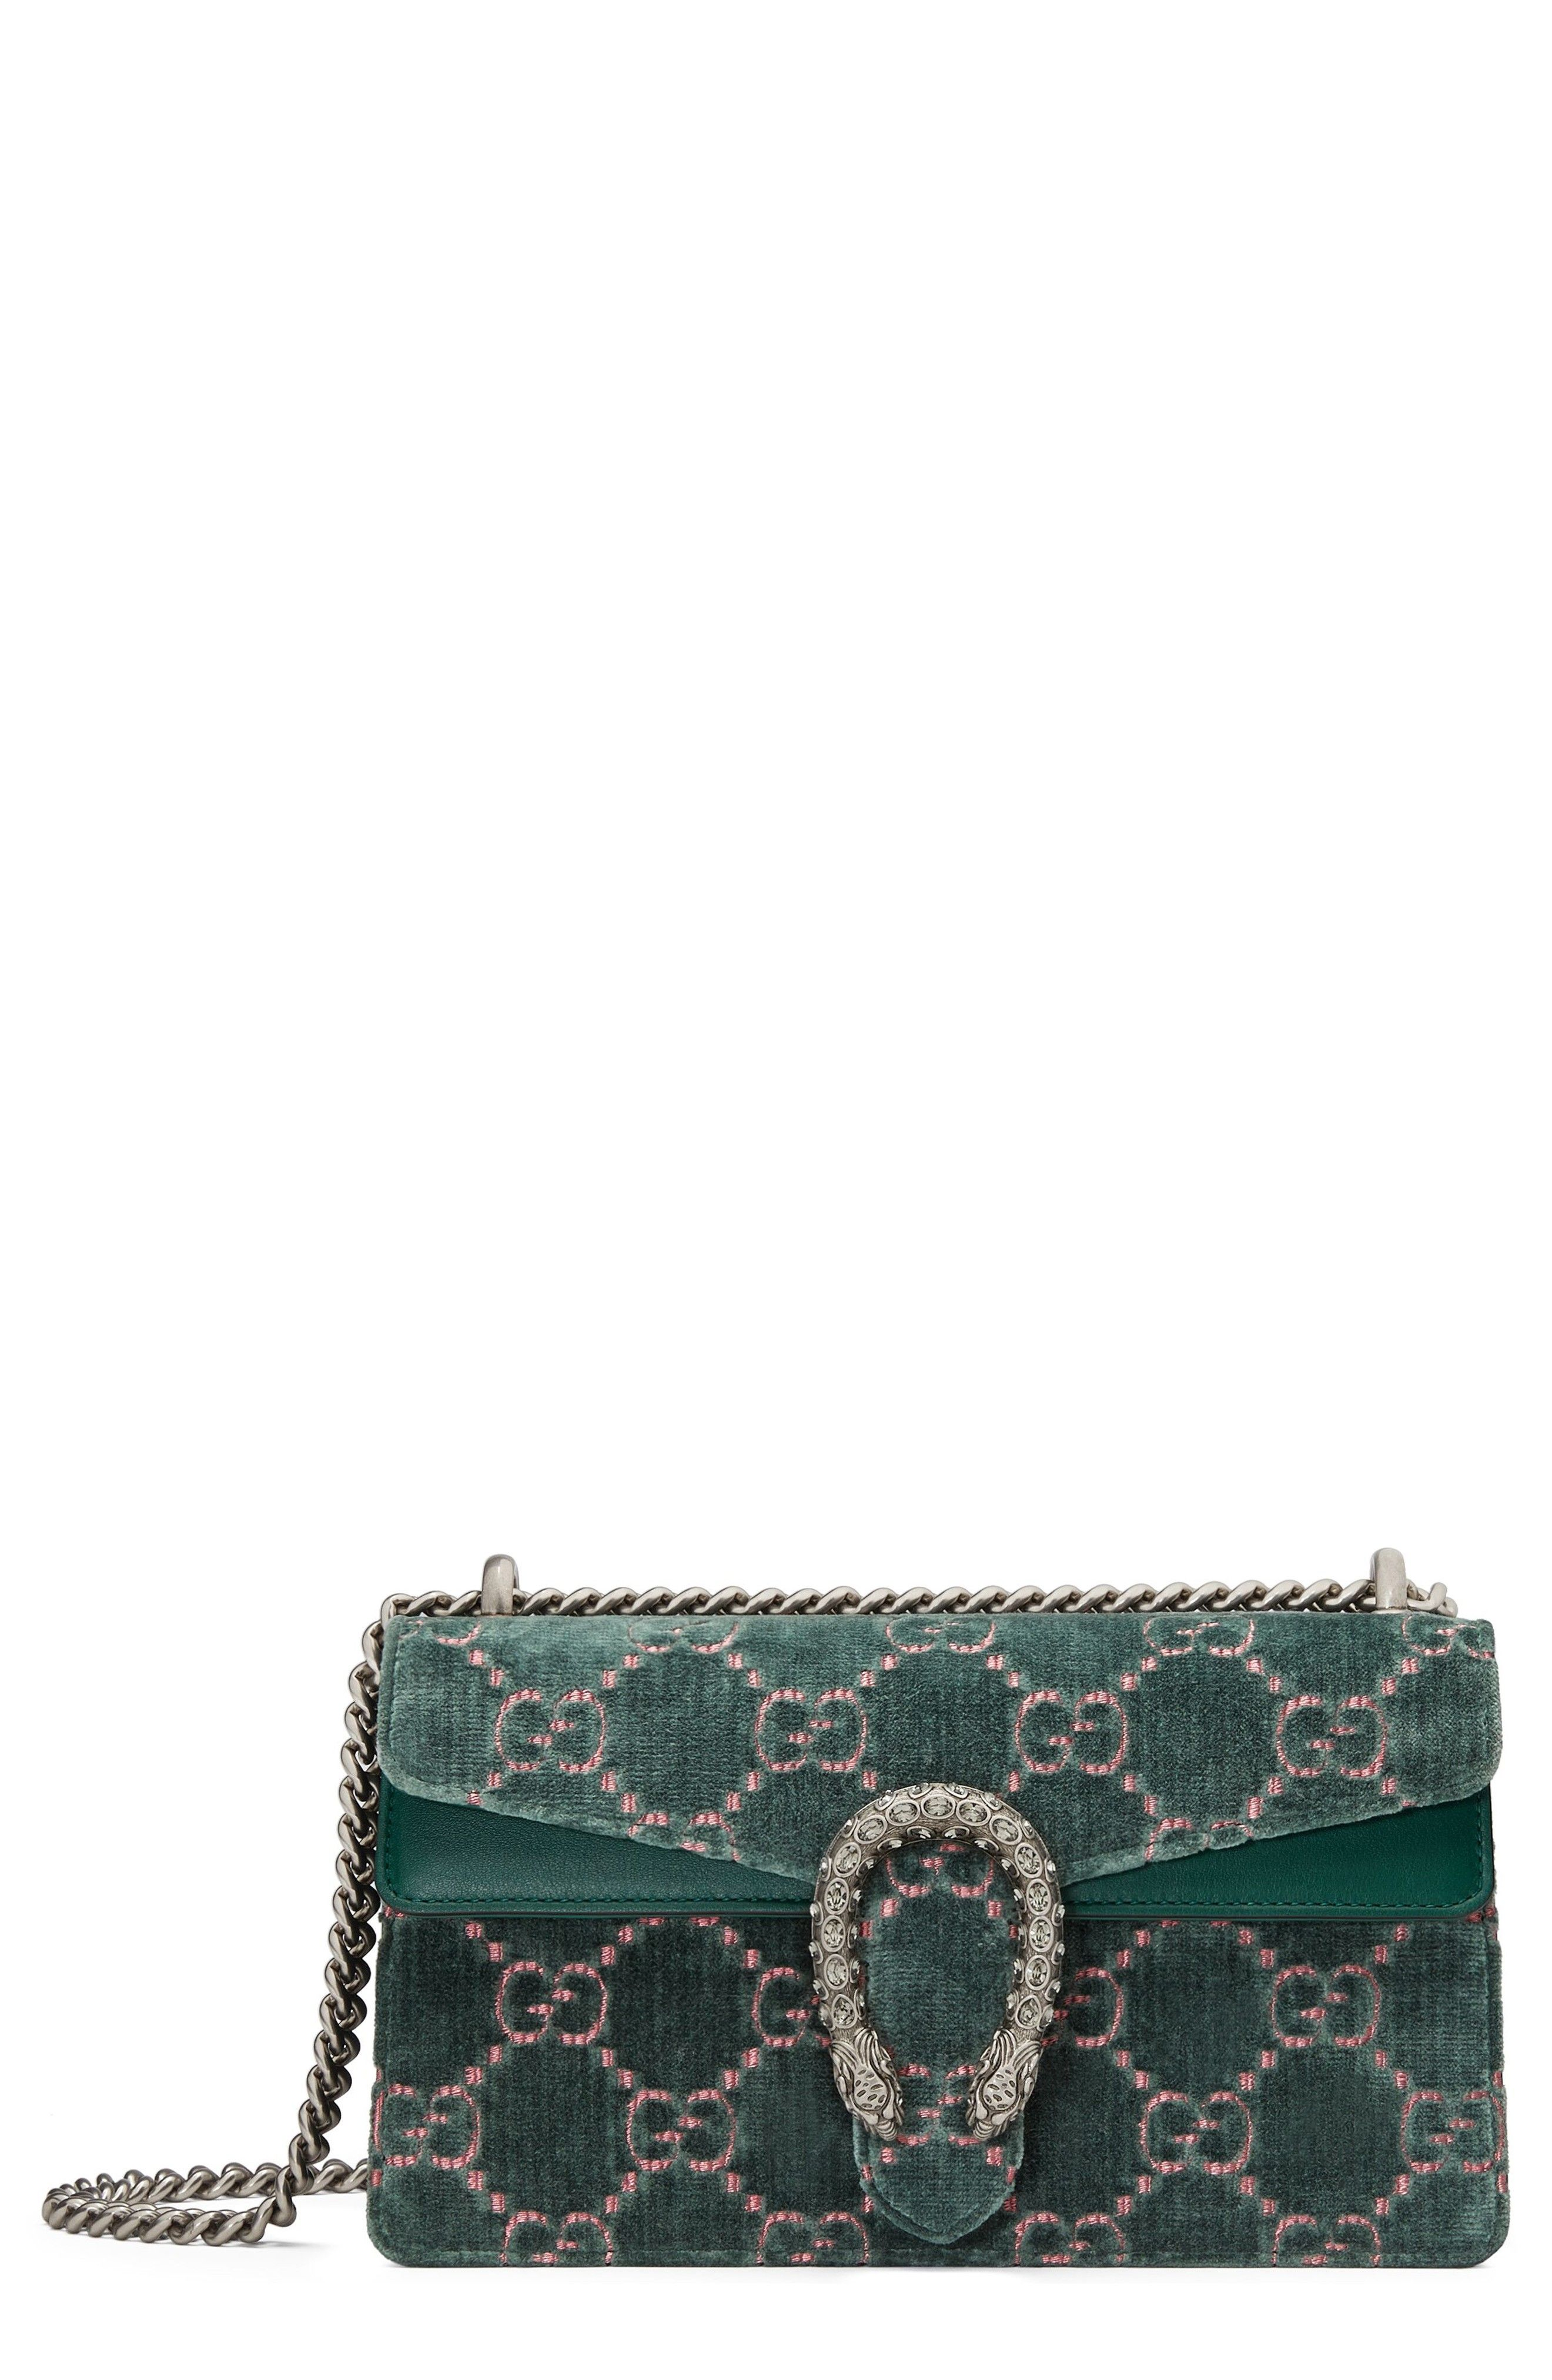 59ac7df23855f3 GUCCI SMALL DIONYSUS GG VELVET SHOULDER BAG - BLUE/GREEN. #gucci #bags #shoulder  bags #hand bags #velvet #